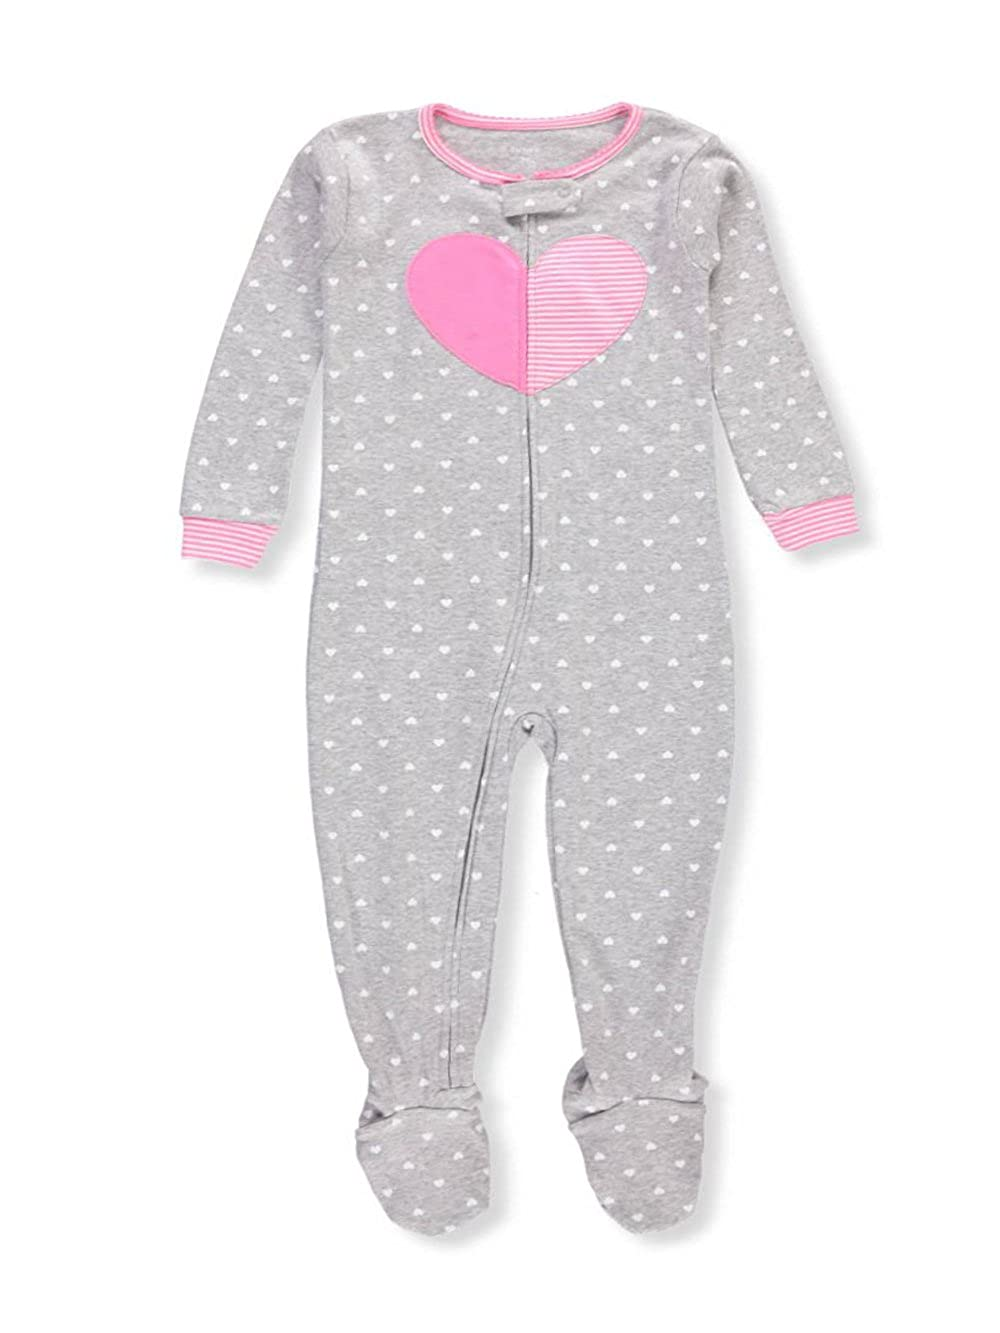 5f8621e35c70 Amazon.com  Carter s Little Girls  1 Piece Snug Fit Cotton Pajamas ...